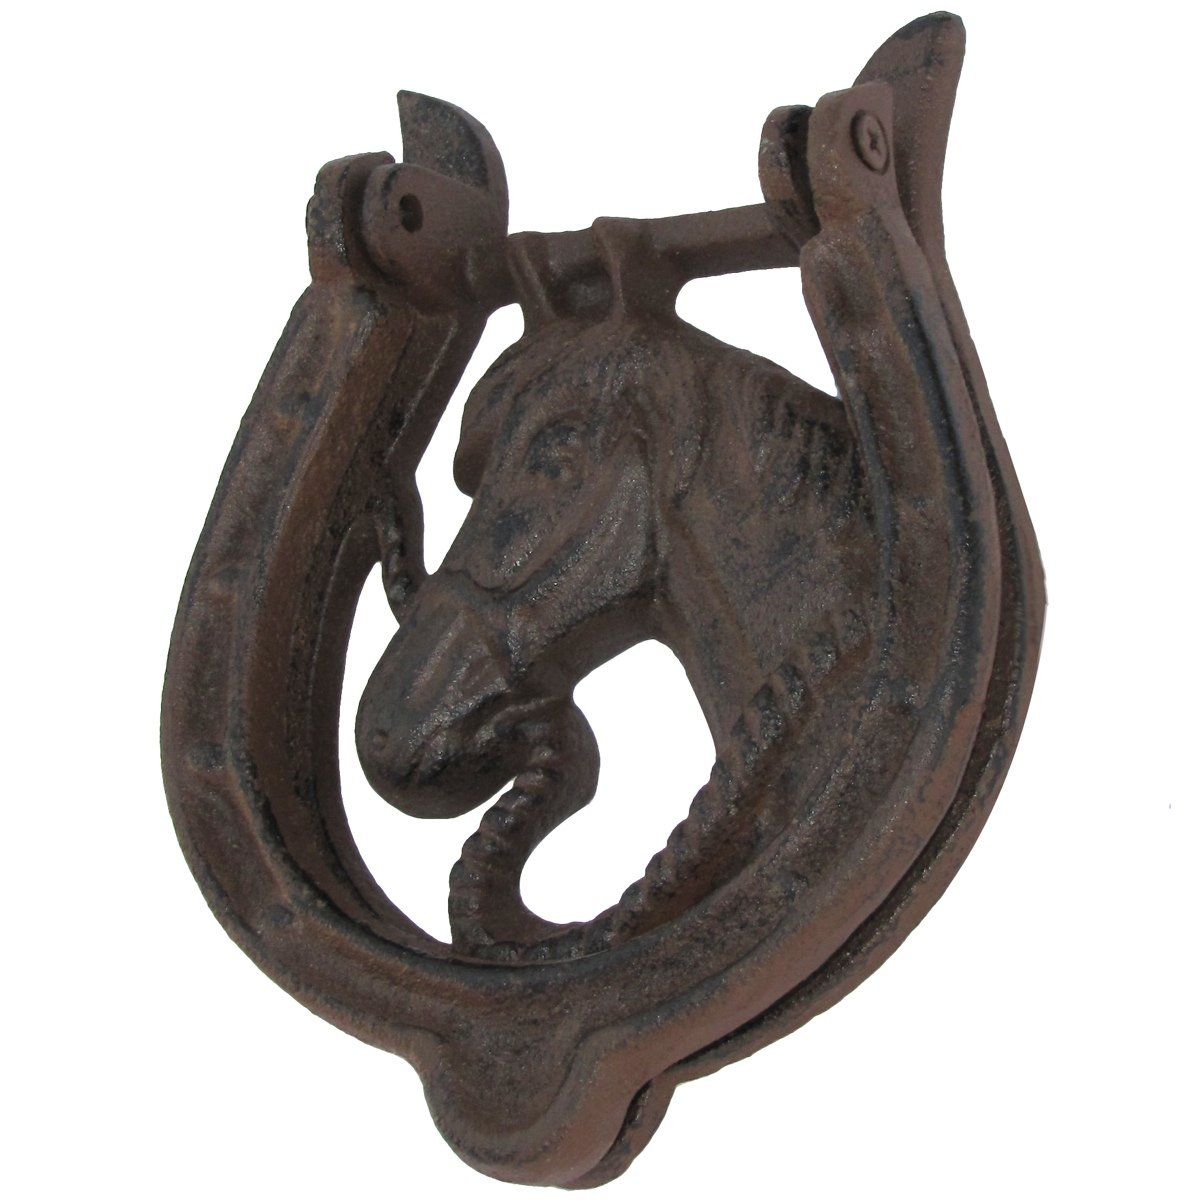 Gold Design Toscano Horseshoe Stallion Foundry Cast Iron Horse Door Knocker